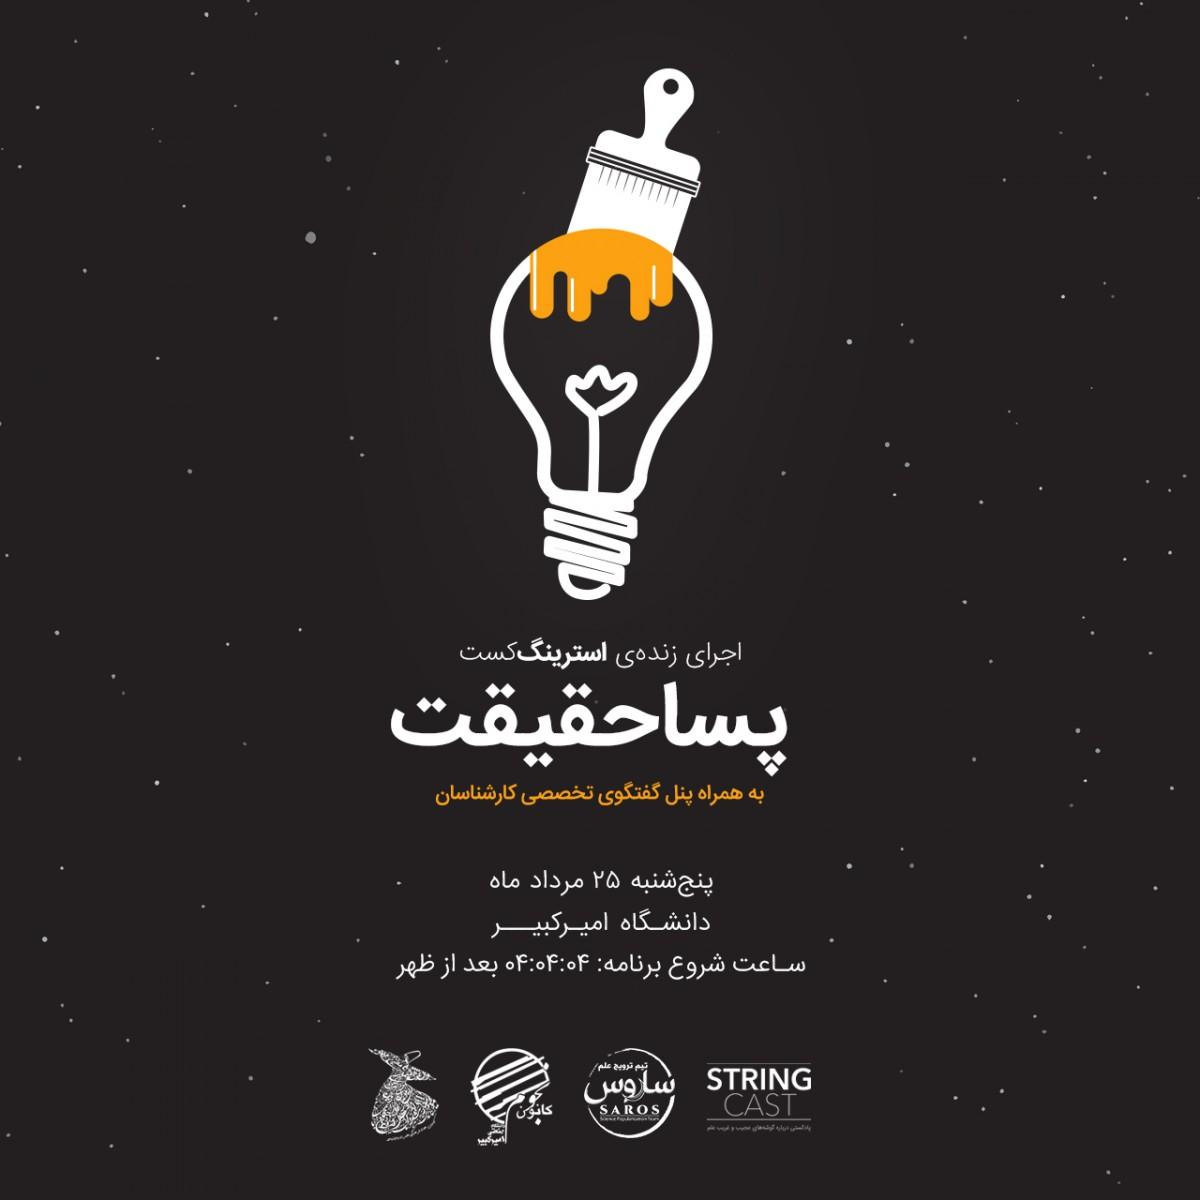 stringcast_pasahaghighat_sqare_001